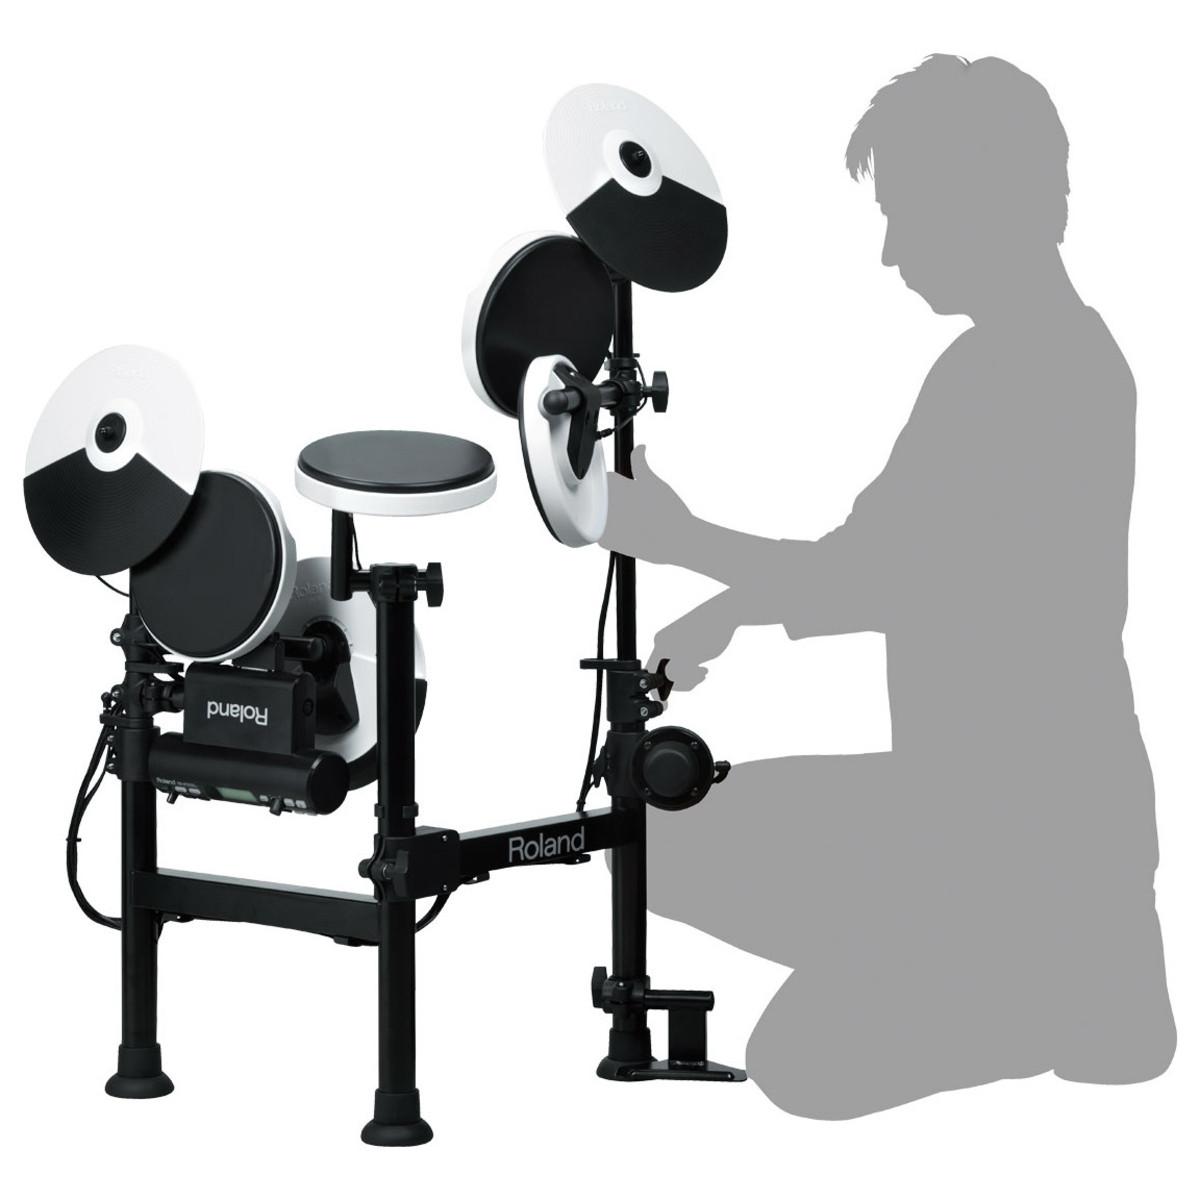 Roland Td 4kp V Drums Portable Electronic Drum Kit At